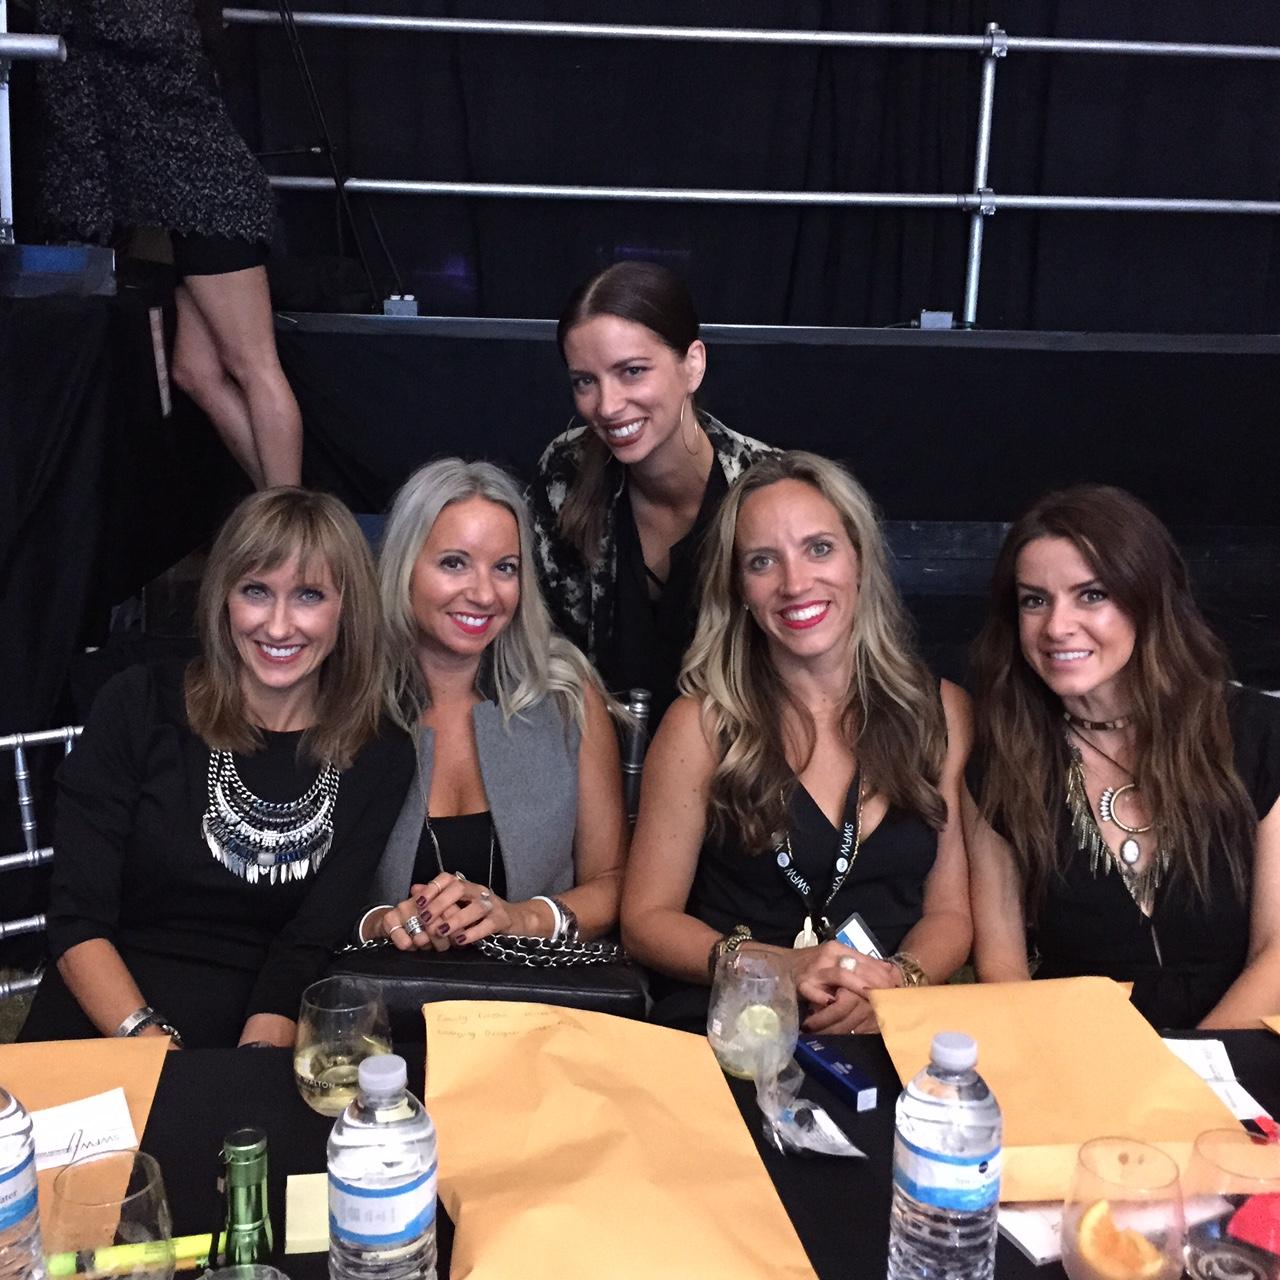 Judges table - (L to R) me, Emily Erusha-Hilleque, Amanda Valentine, Carla Beveridge & Shelly Brown.